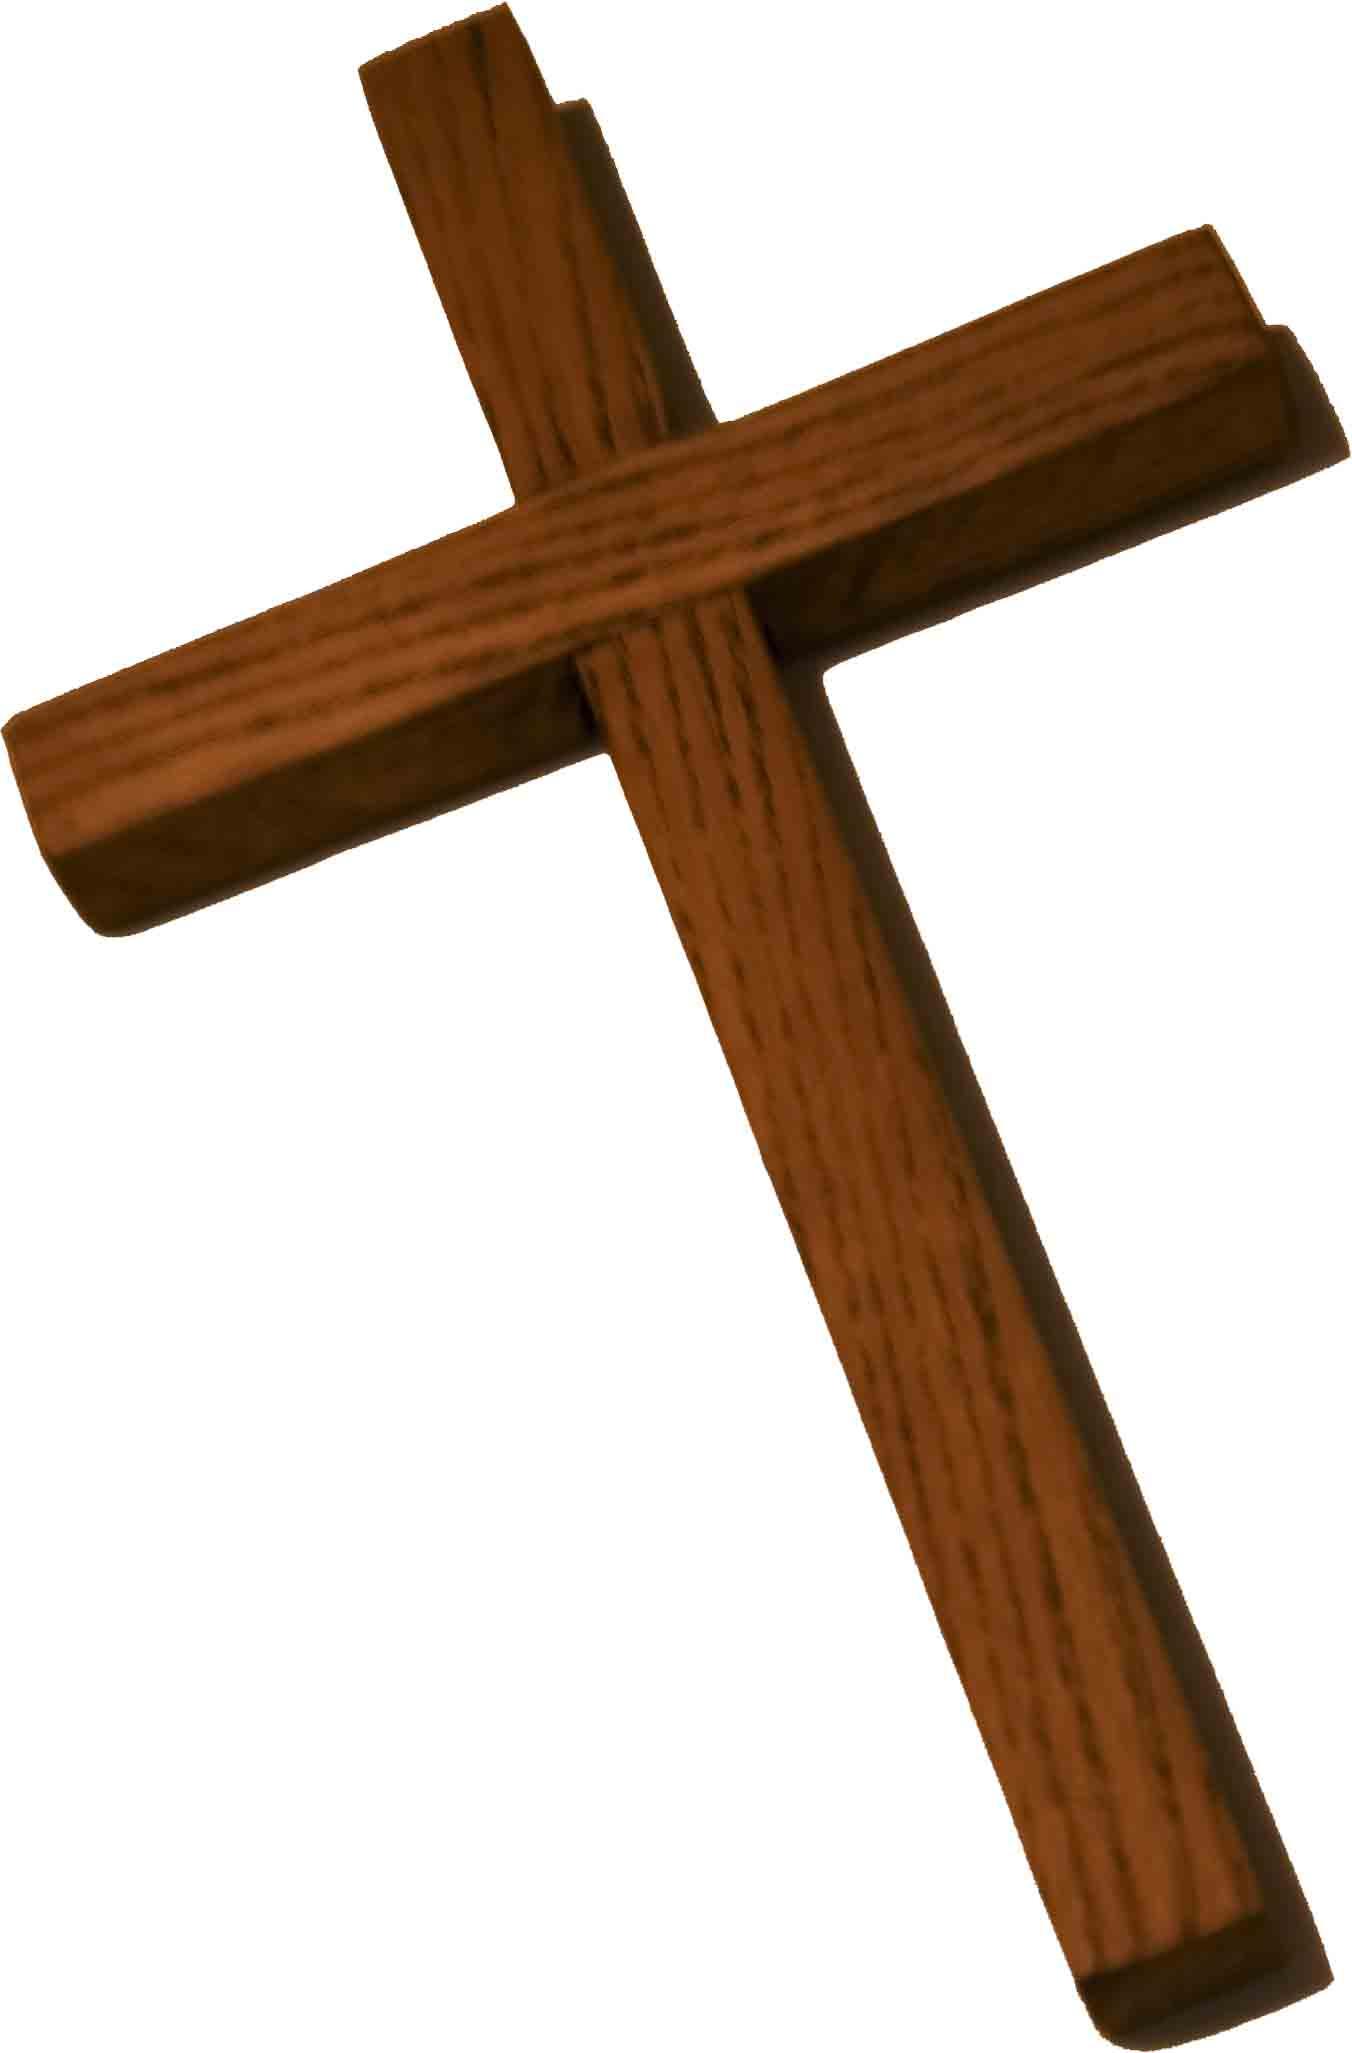 Clipart cross wooden cross. Wikiclipart